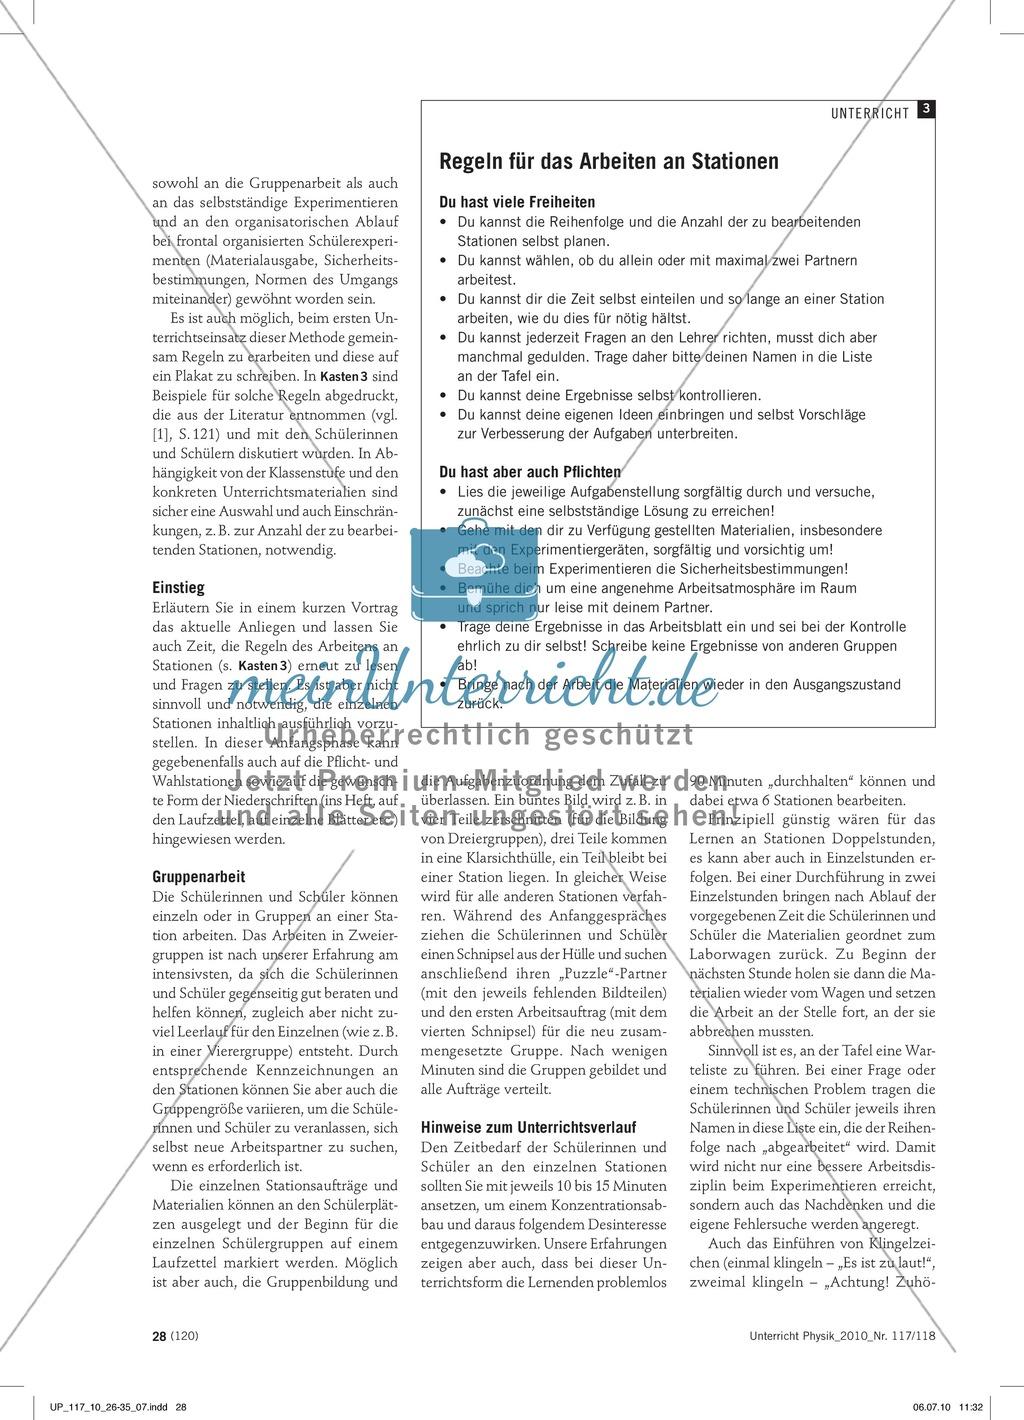 Awesome Anzahl Namen 1 100 Arbeitsblatt Image - Kindergarten ...